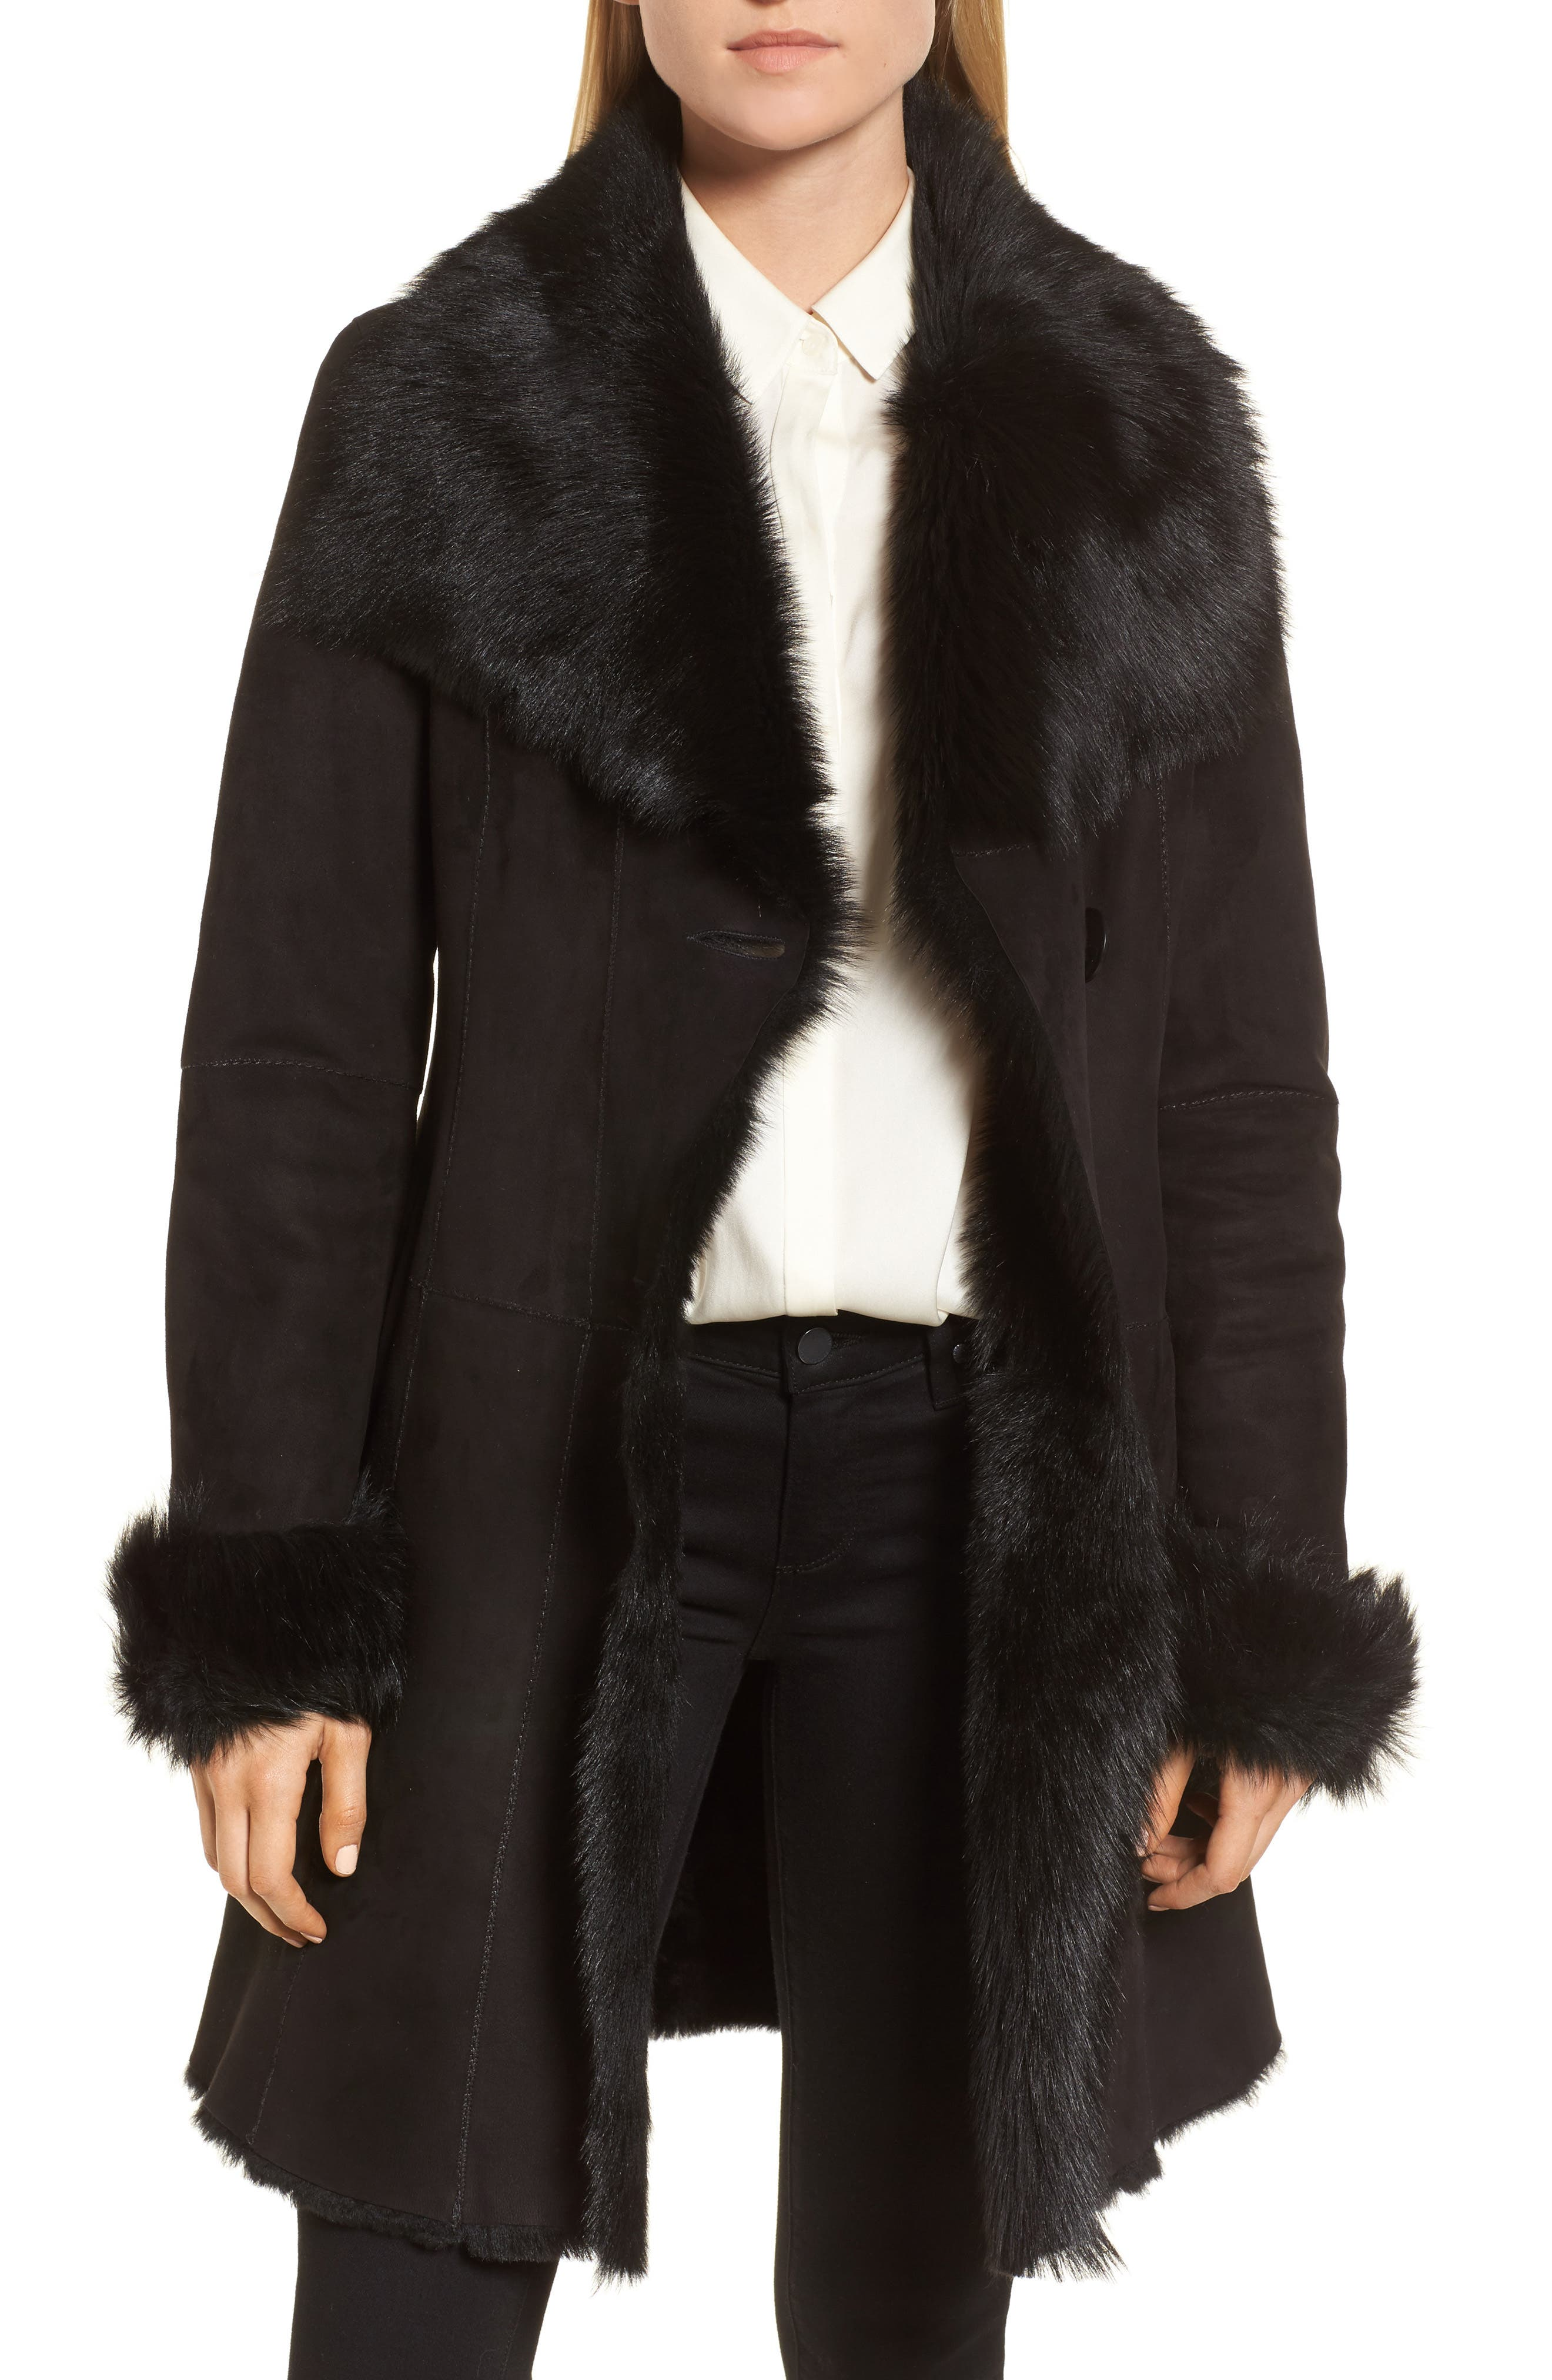 All black shearling coat